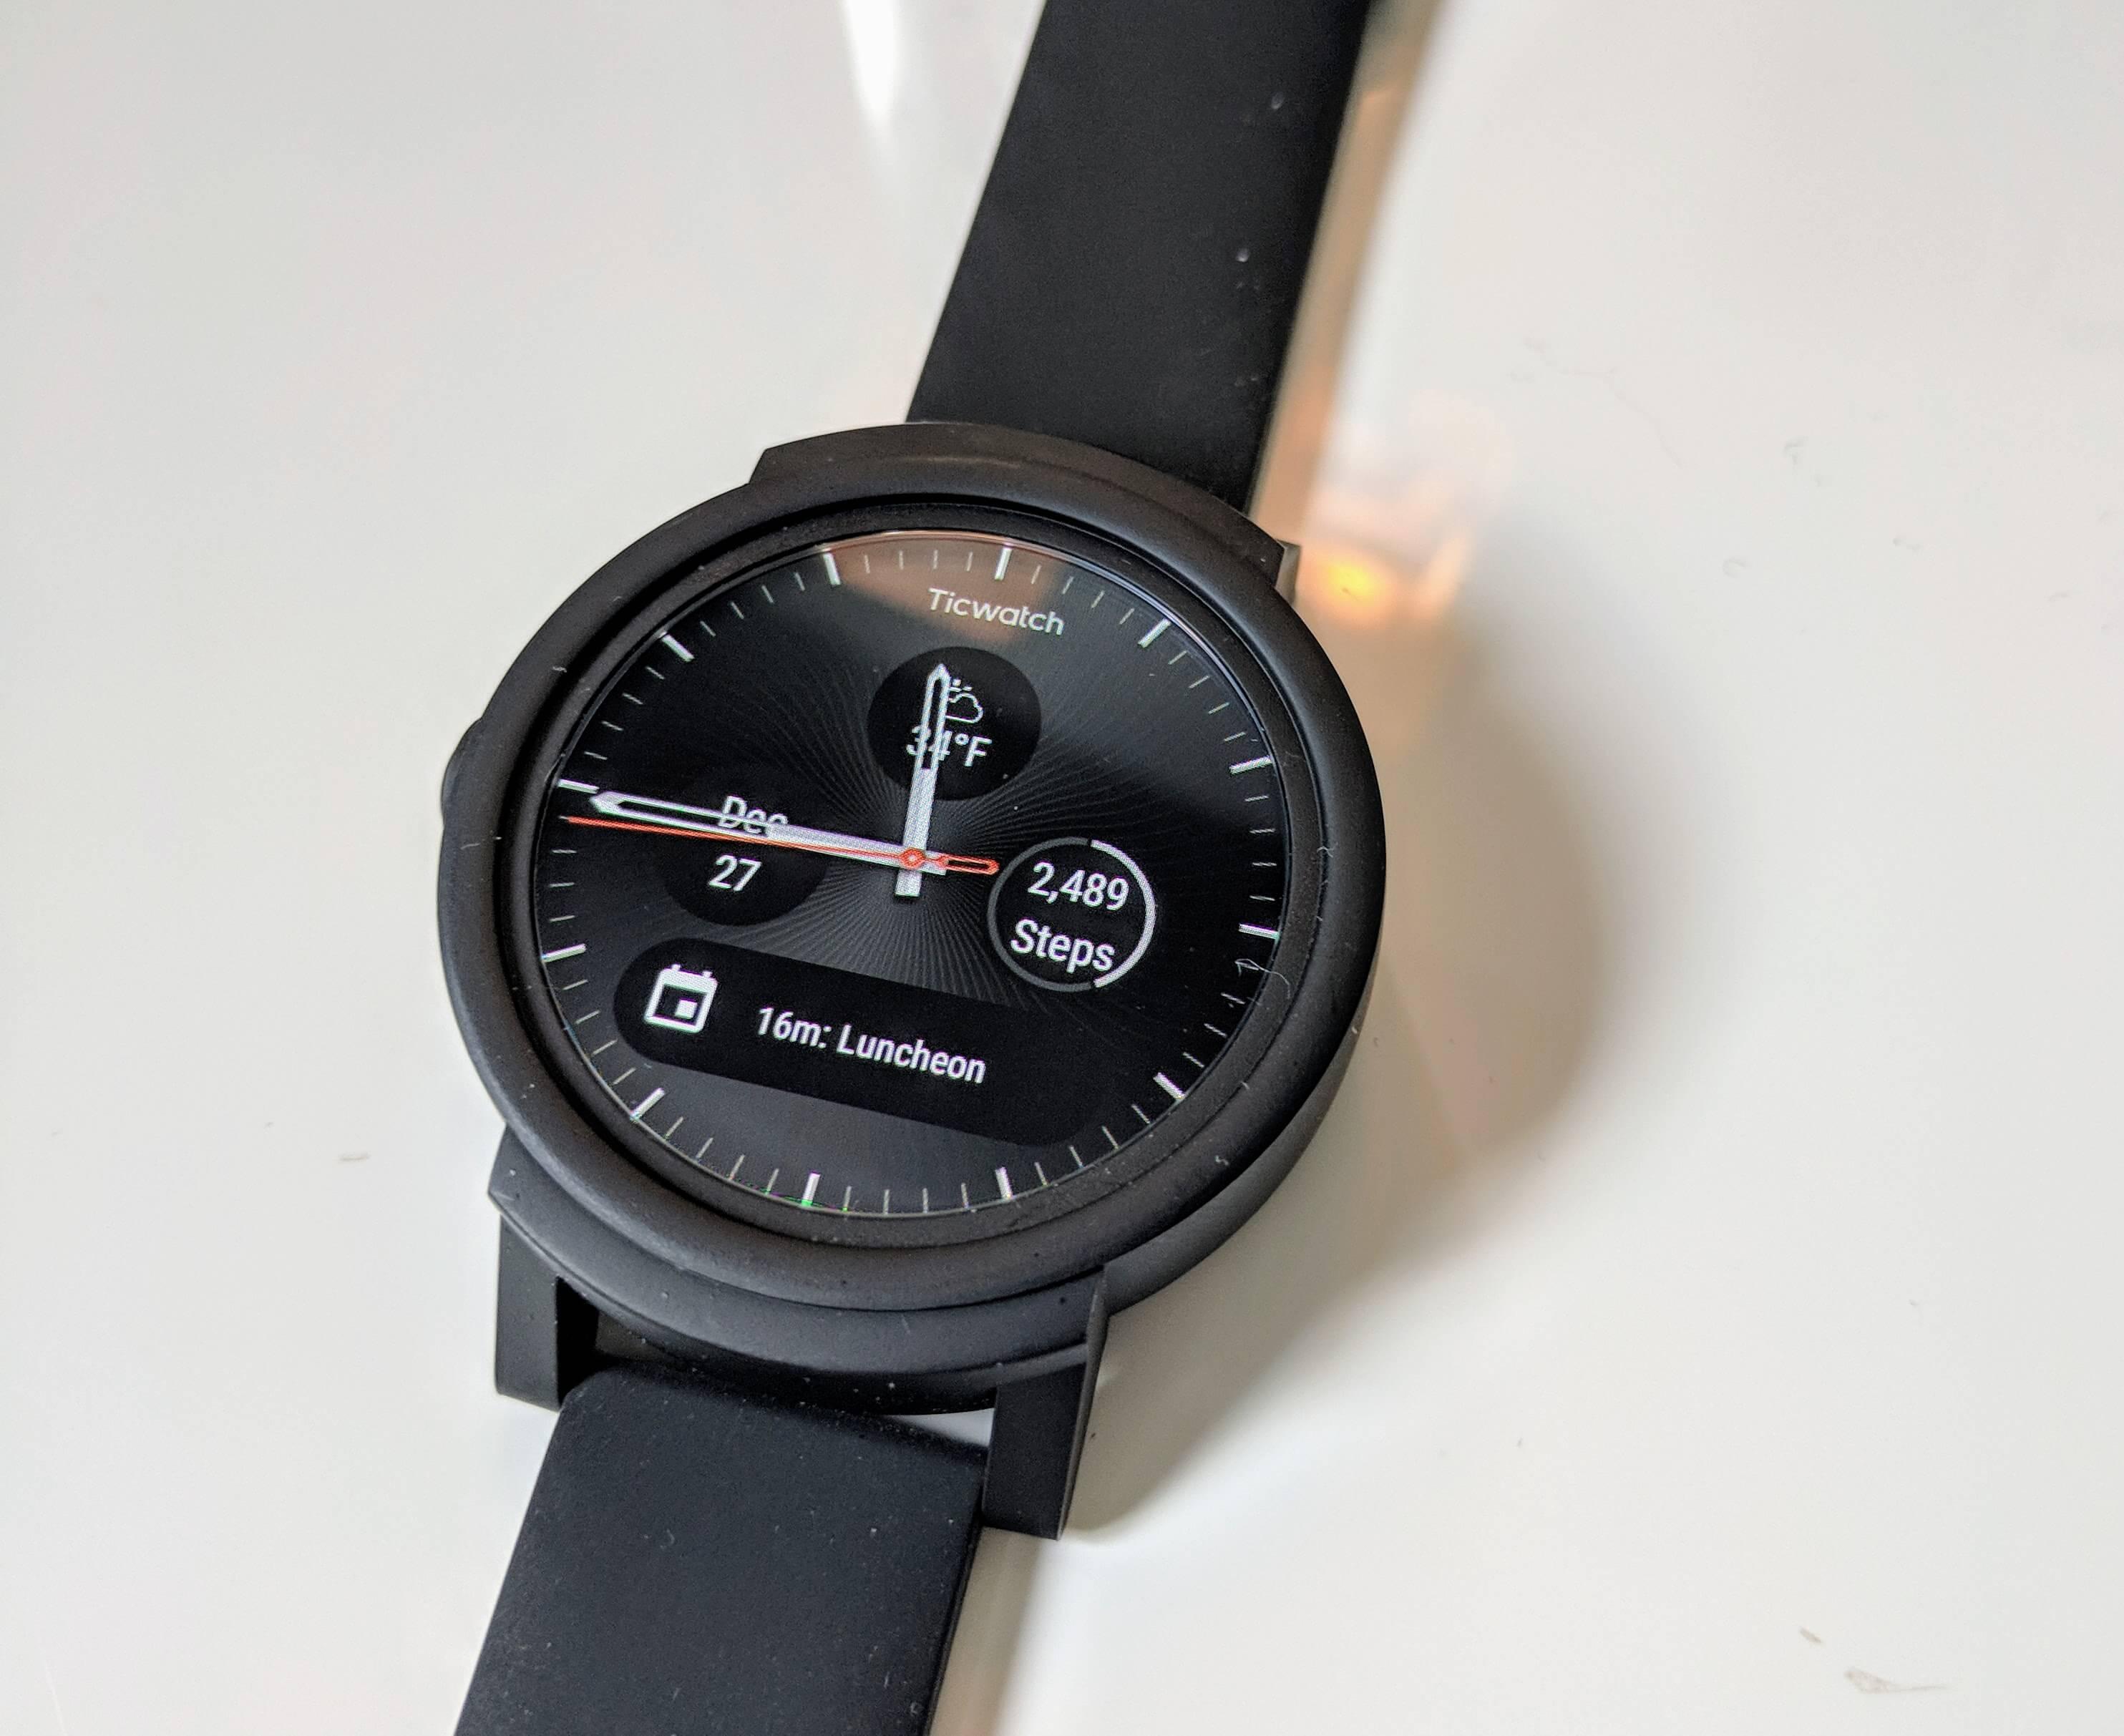 The Mobvoi Ticwatch E